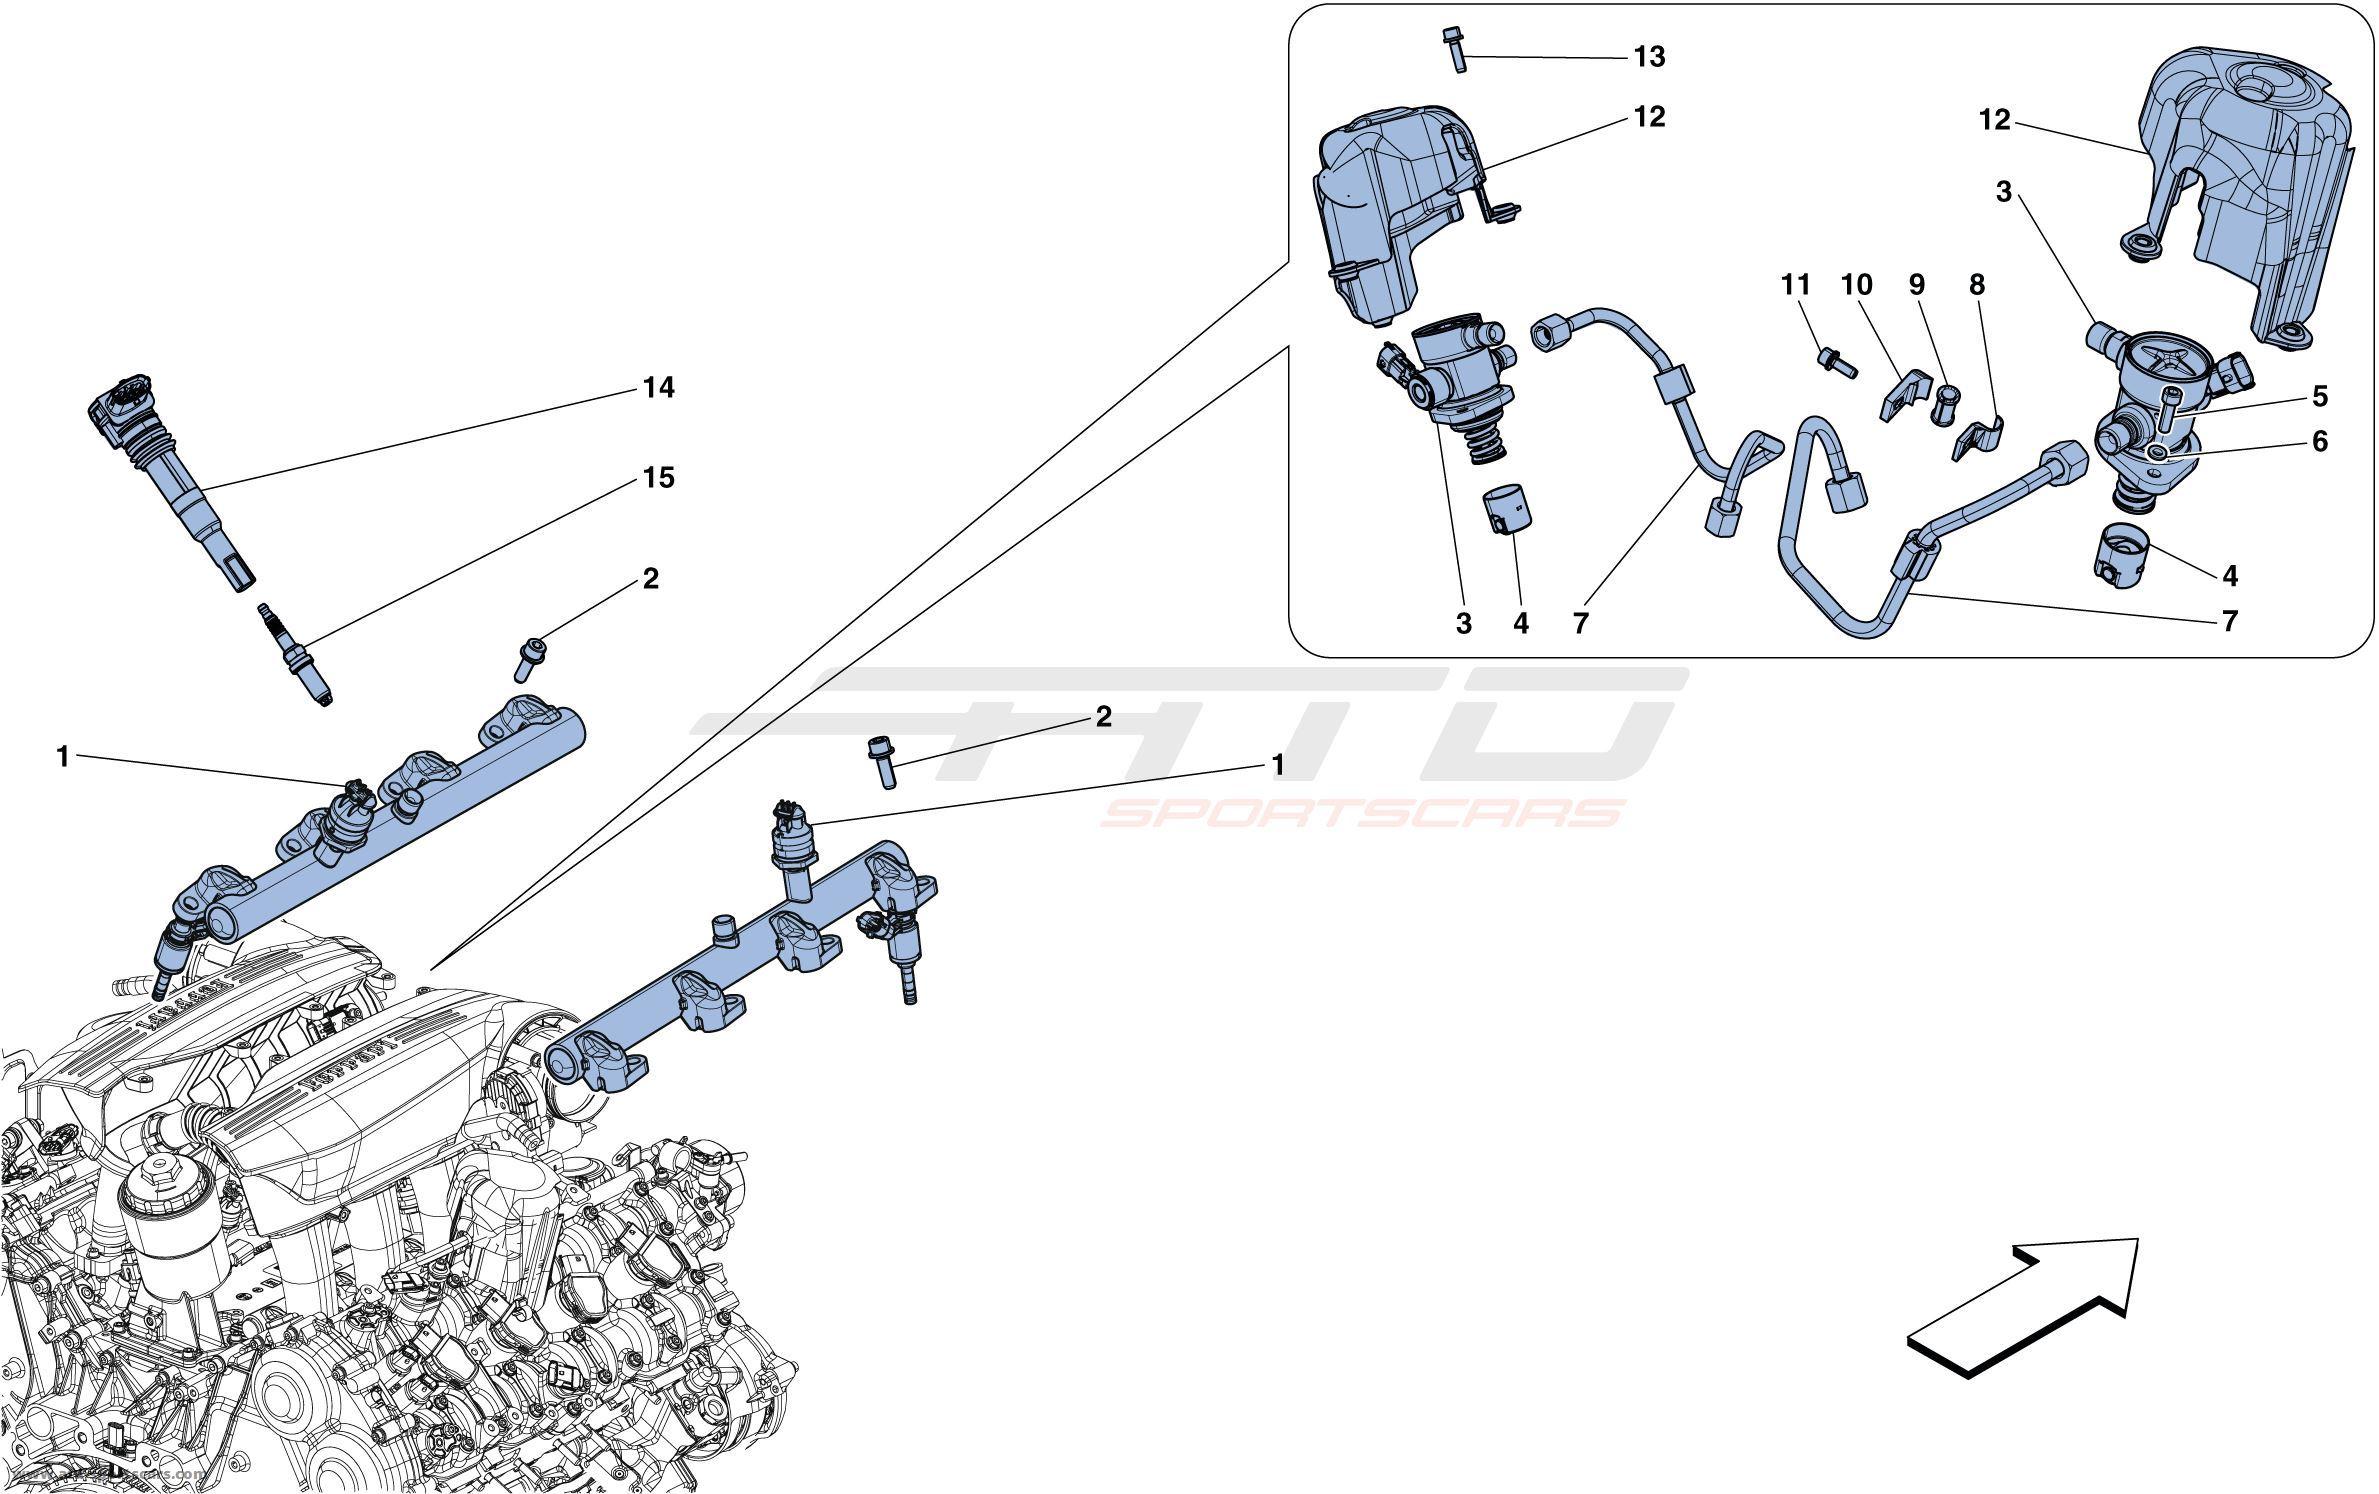 Ferrari 488 Gtb Parts Catalog Order Online Atd Sportscars Element Ac Compressor Assemblies Diagram Car Injection Ignition System 0007